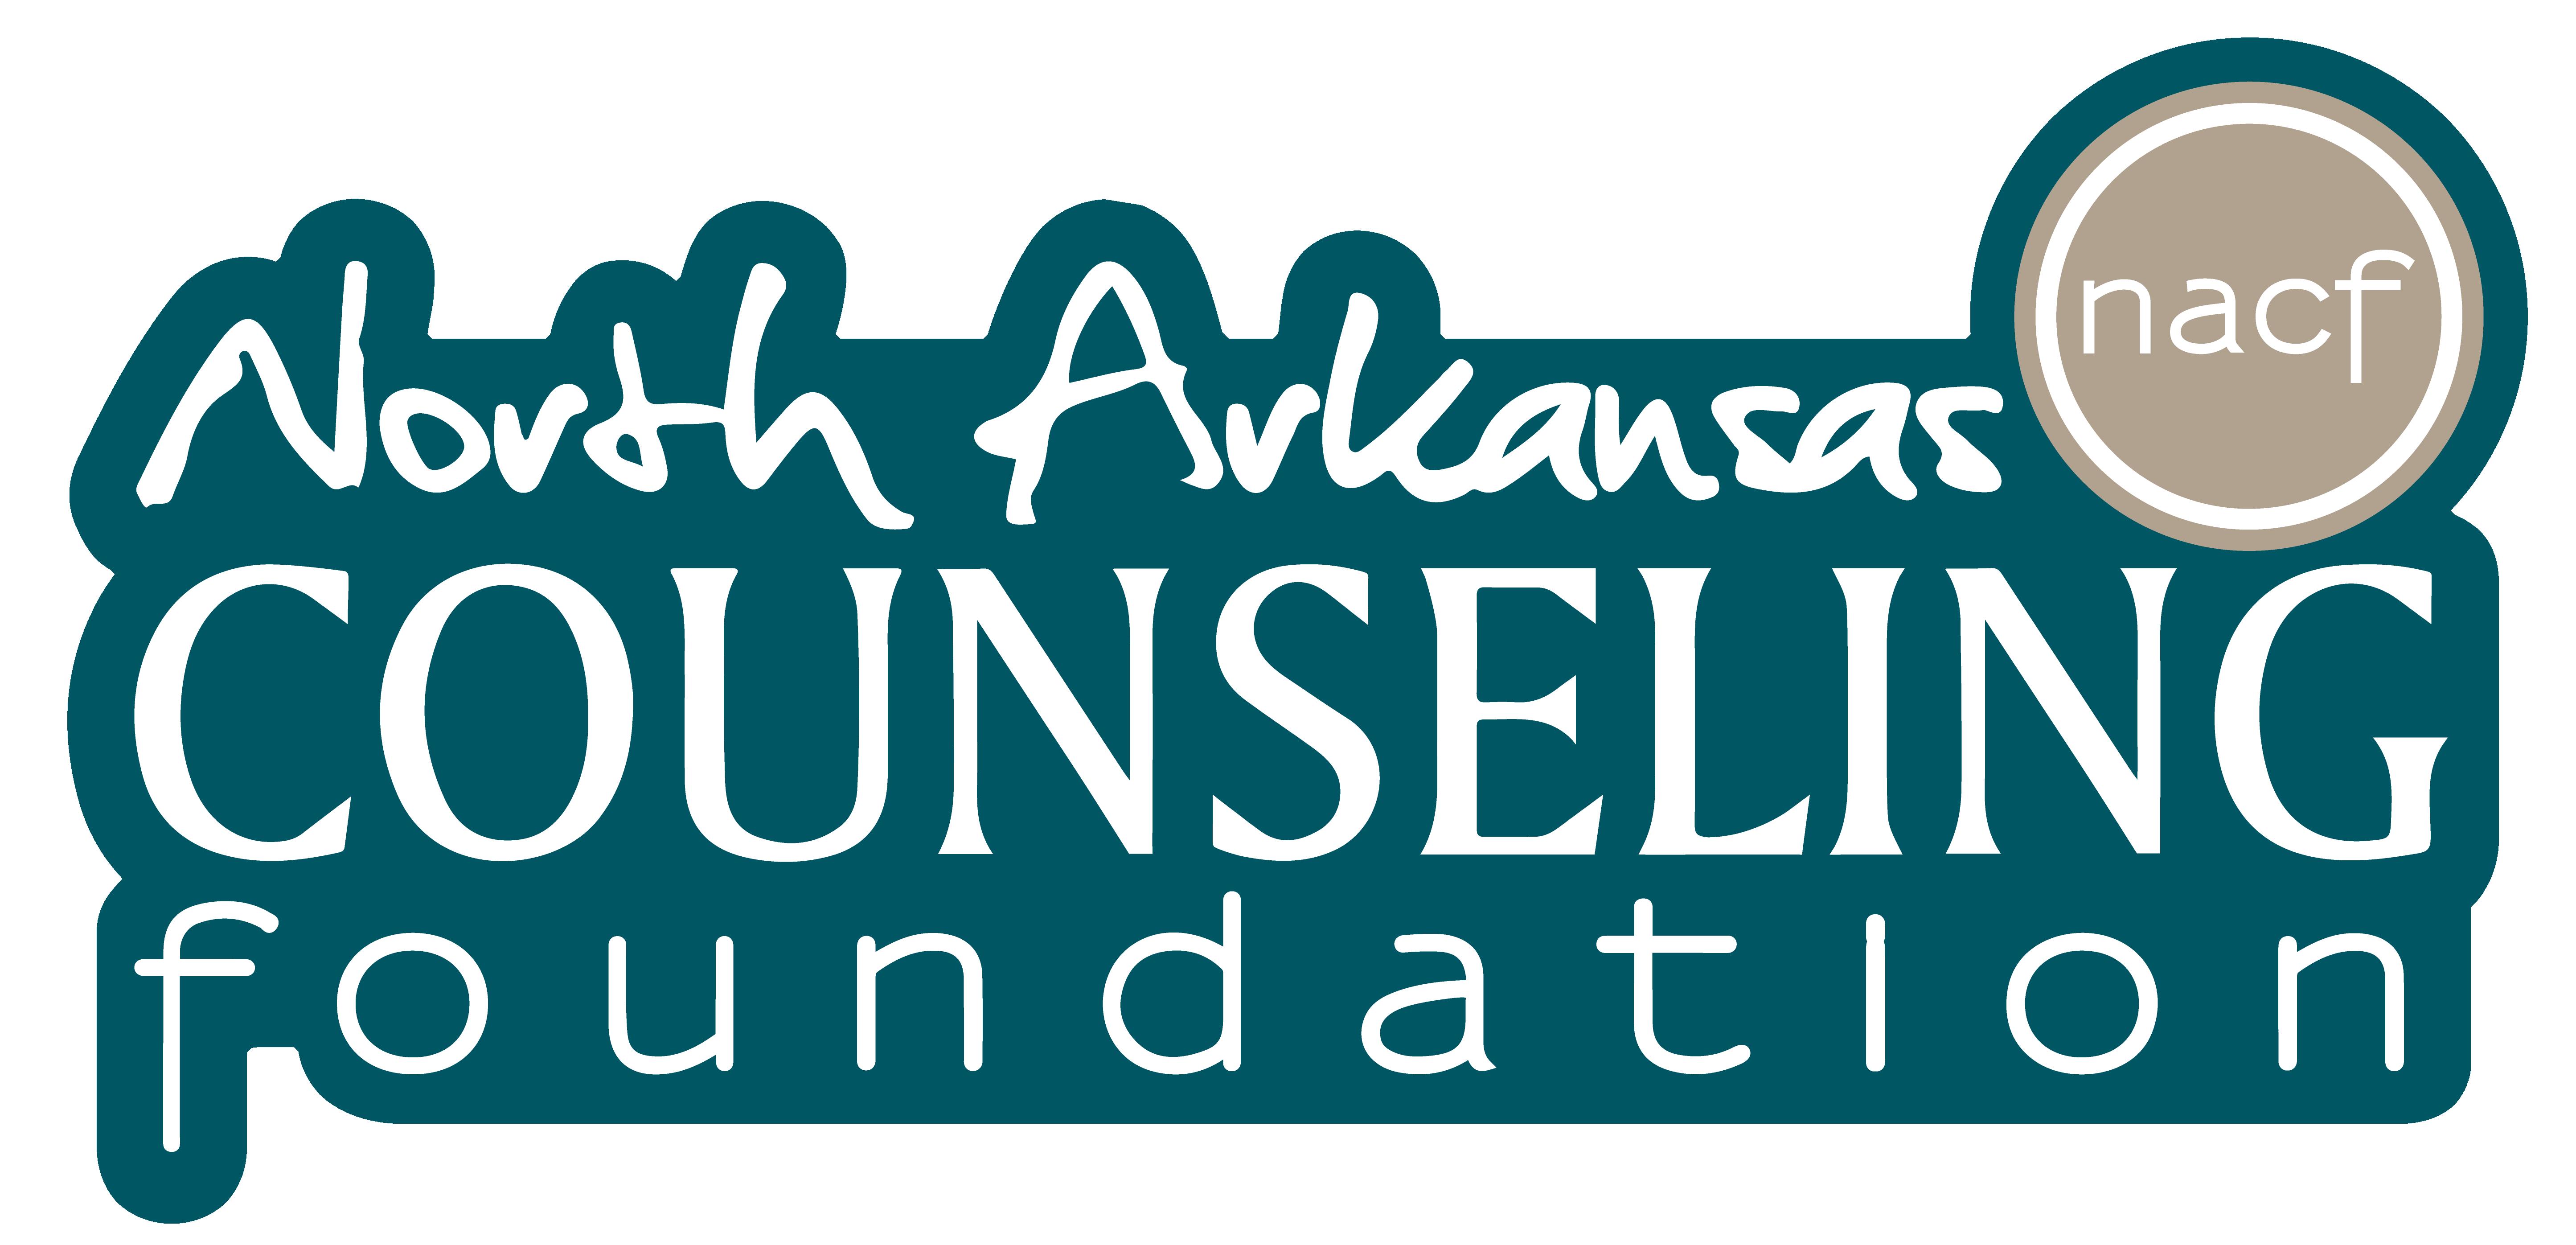 North Arkansas Counseling Foundation, Inc.